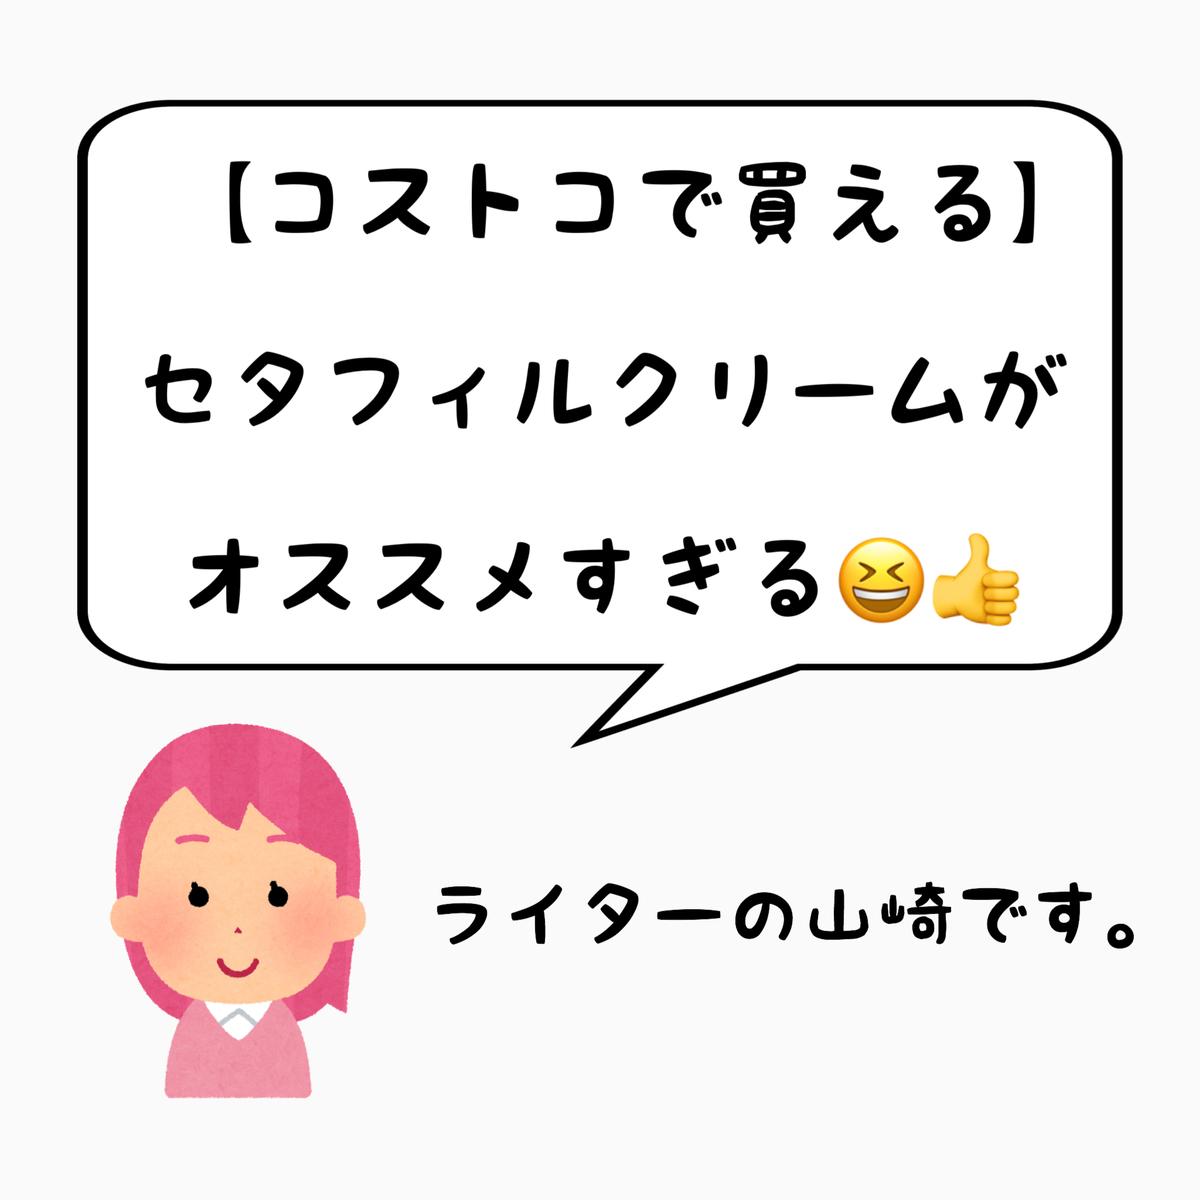 f:id:nokonoko_o:20201020144421j:plain